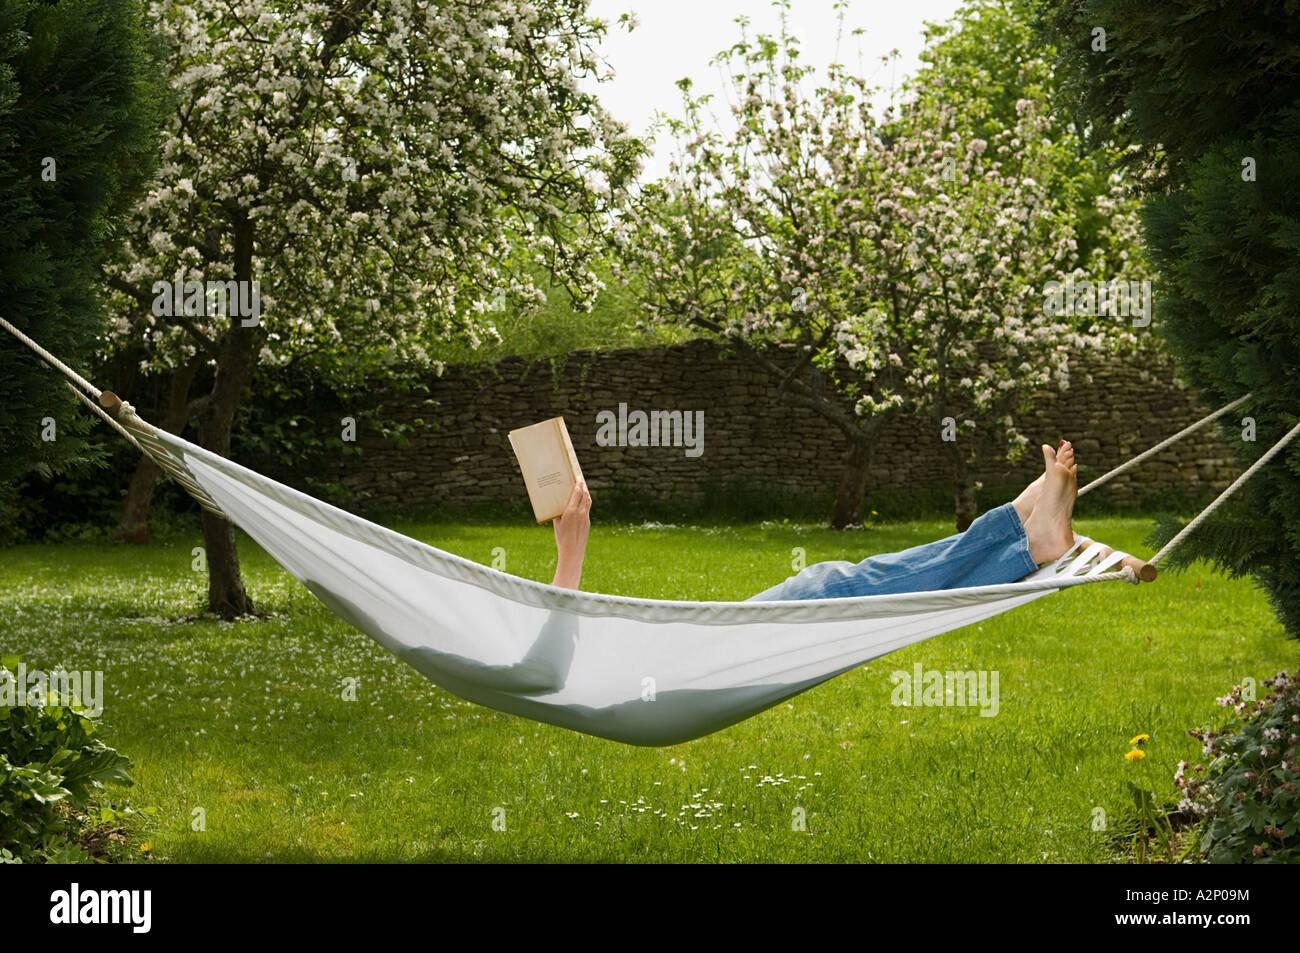 Woman in hammock reading book - Stock Image